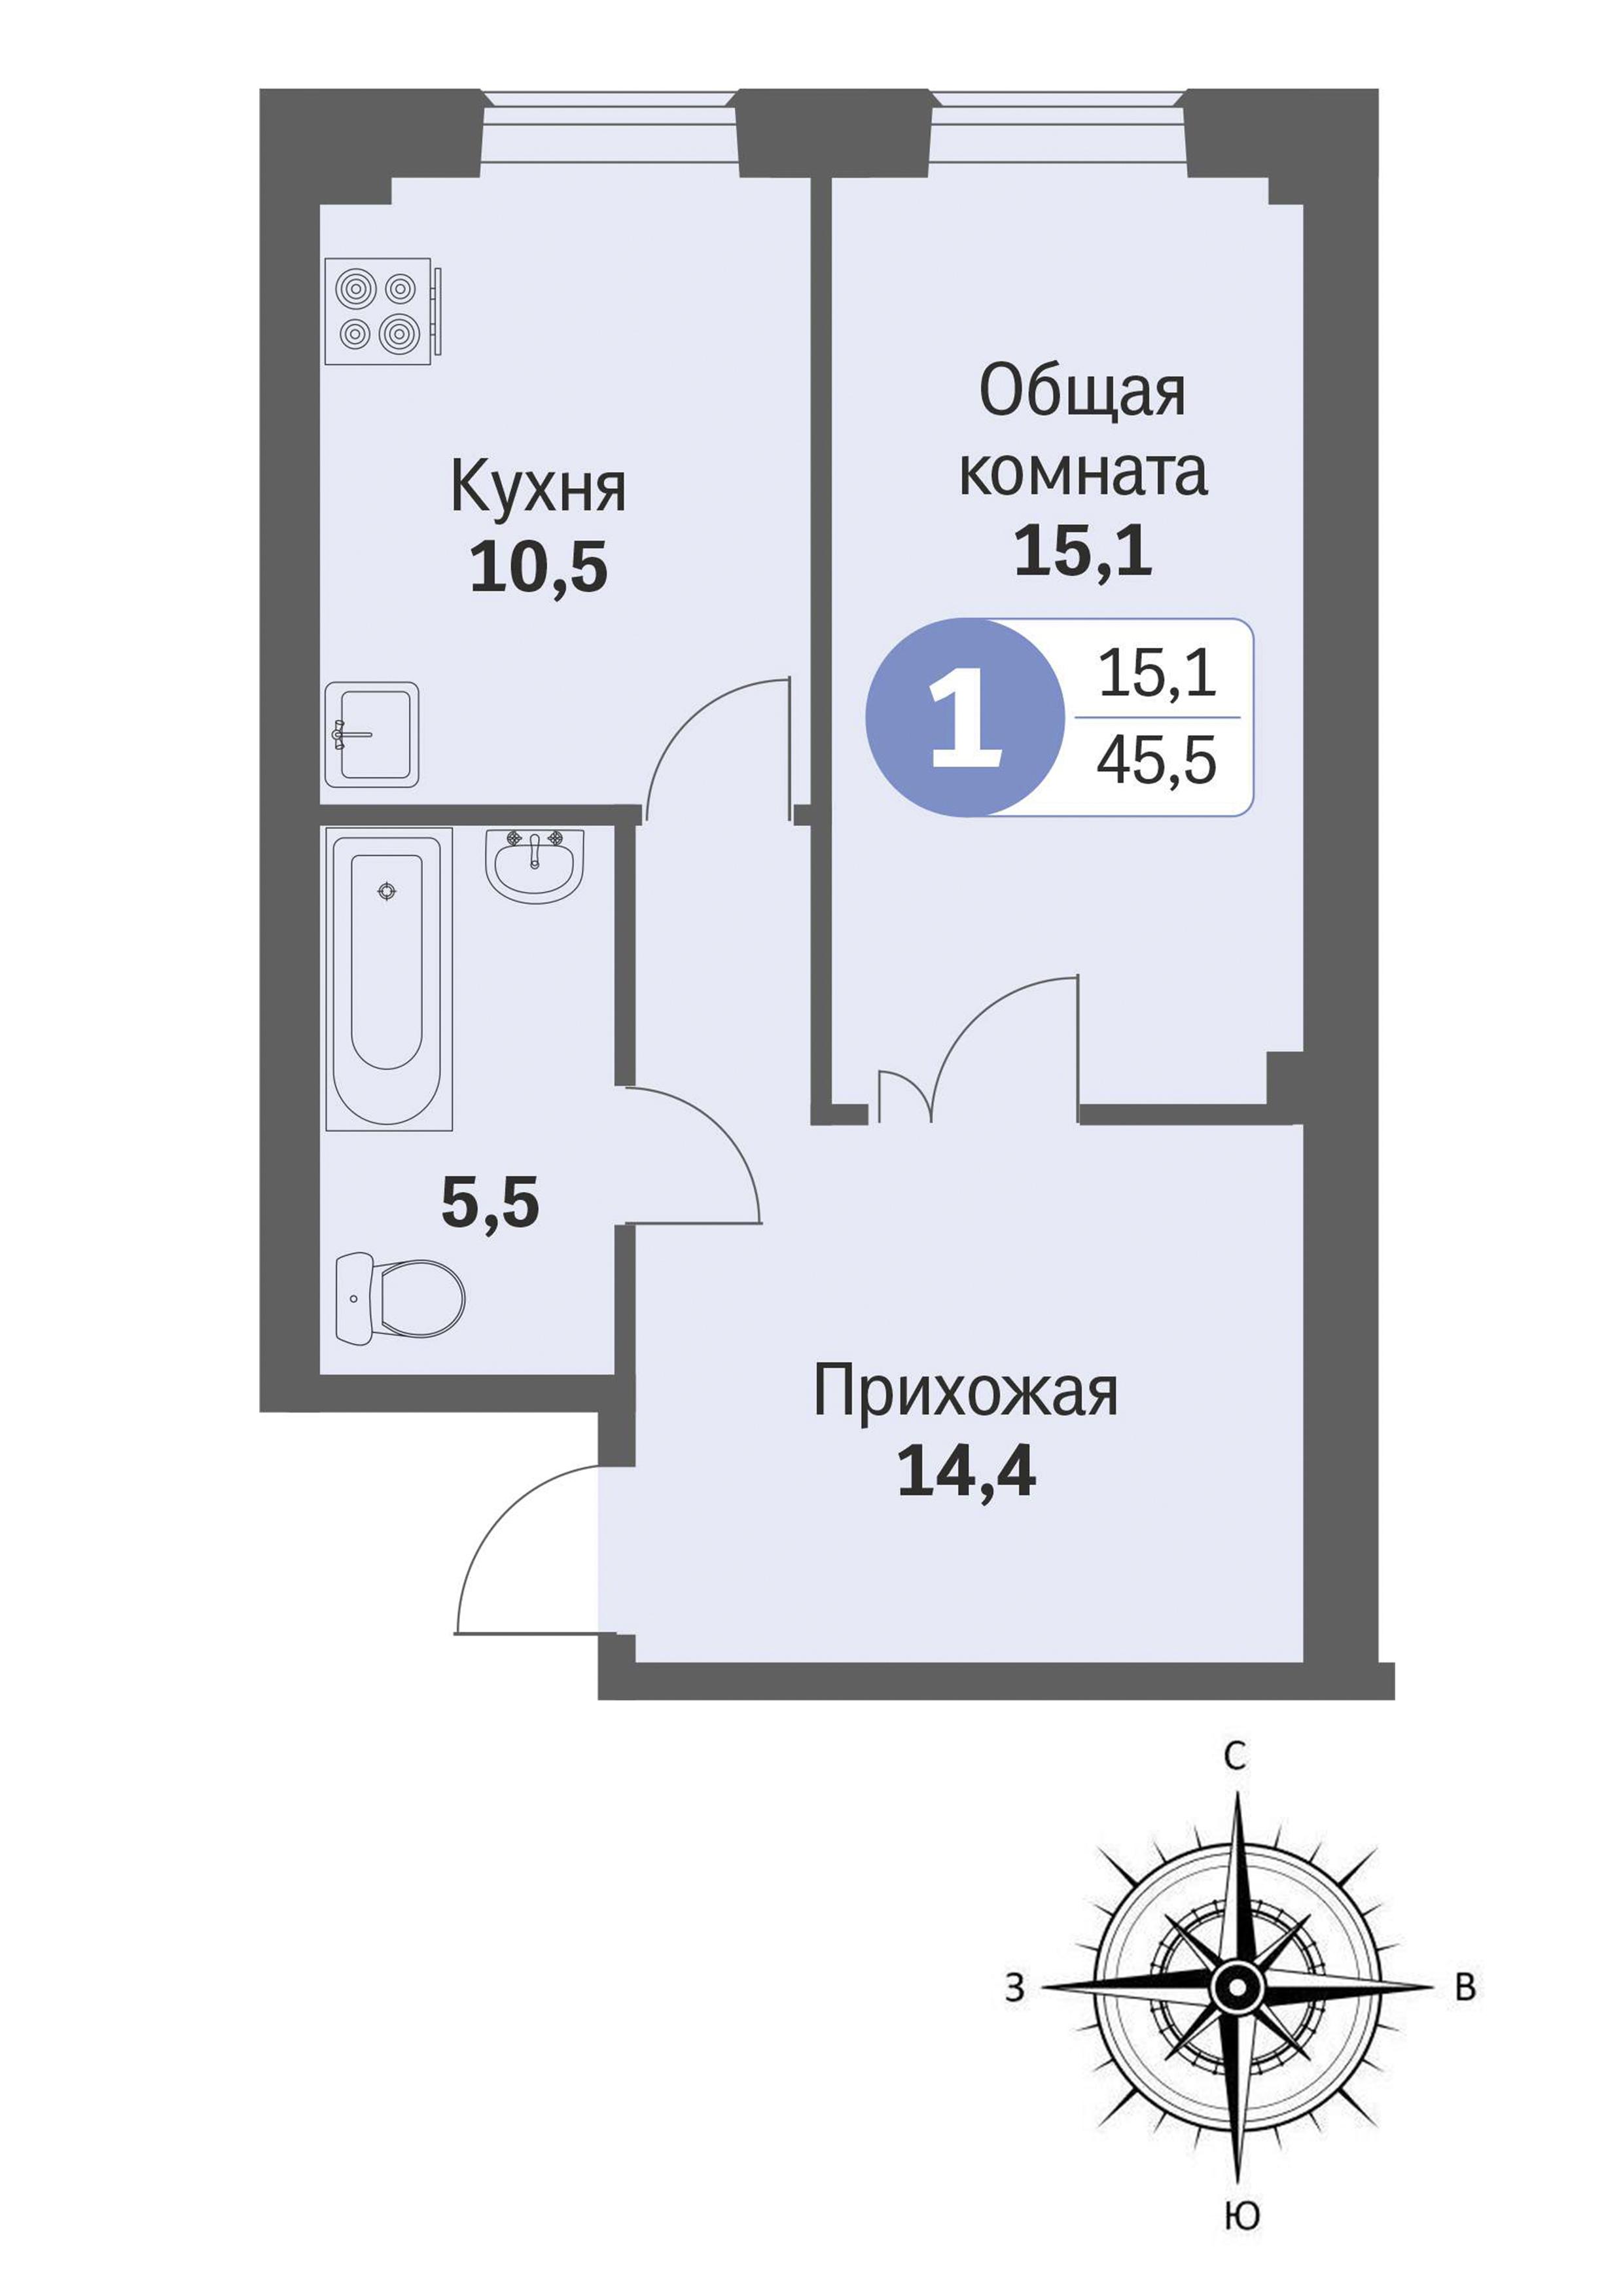 ул. Свиридова, 14, квартира 392 - Однокомнатная